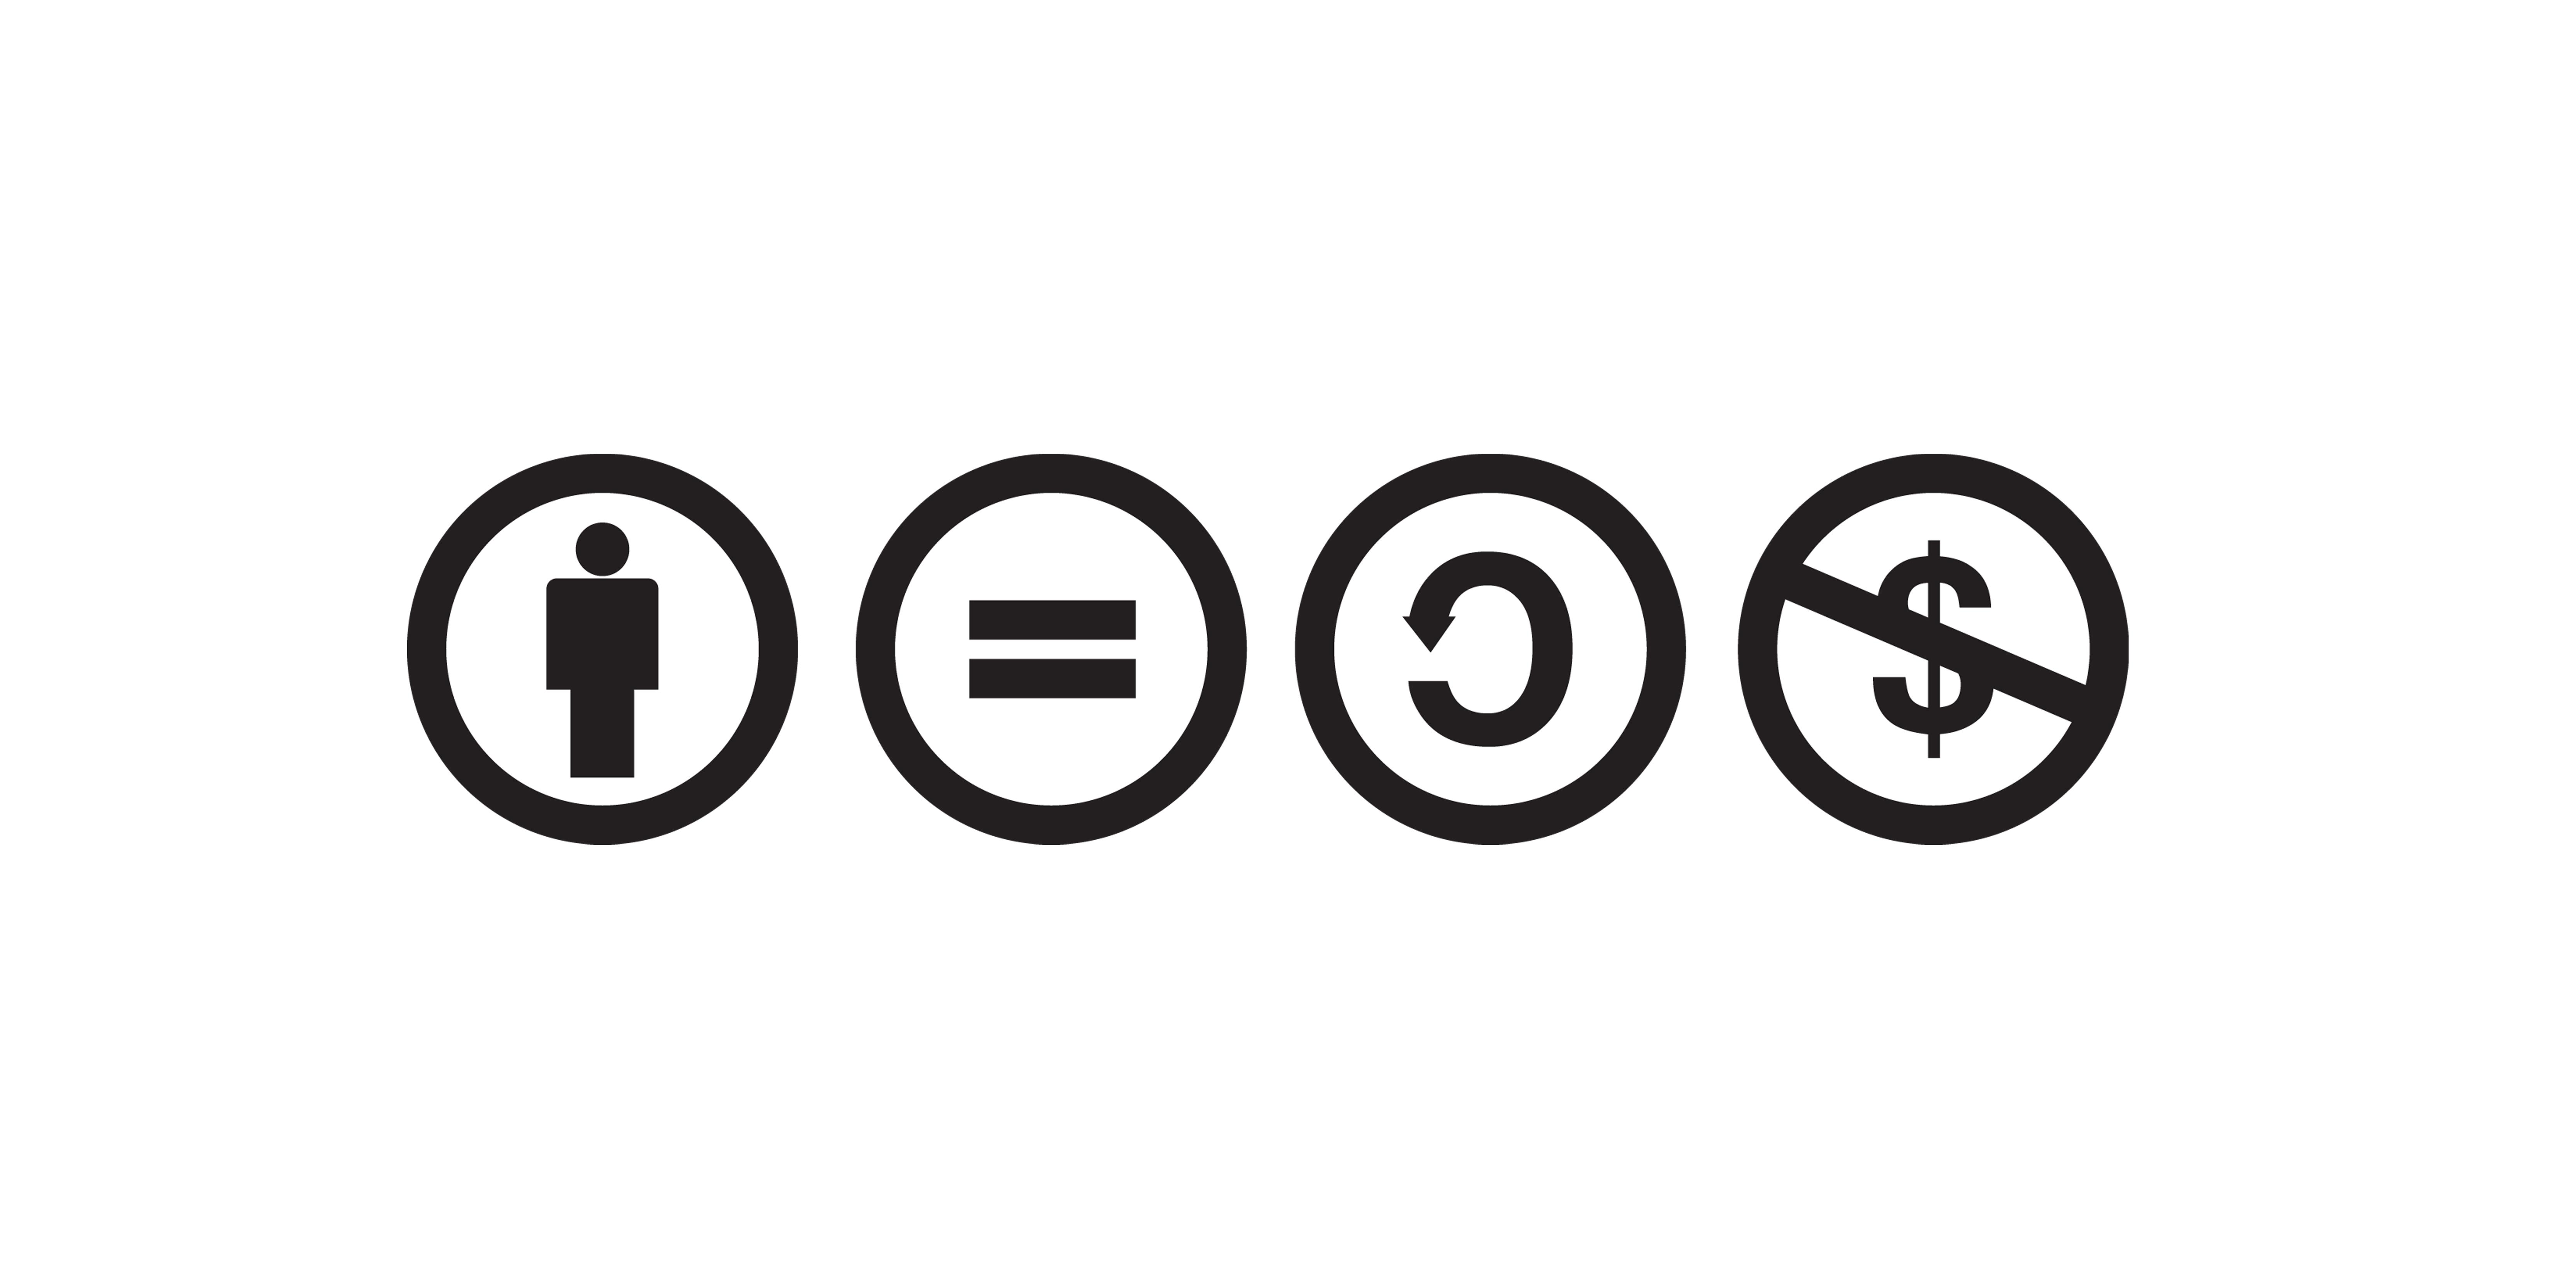 Creative Commons Software Parametricmonkey